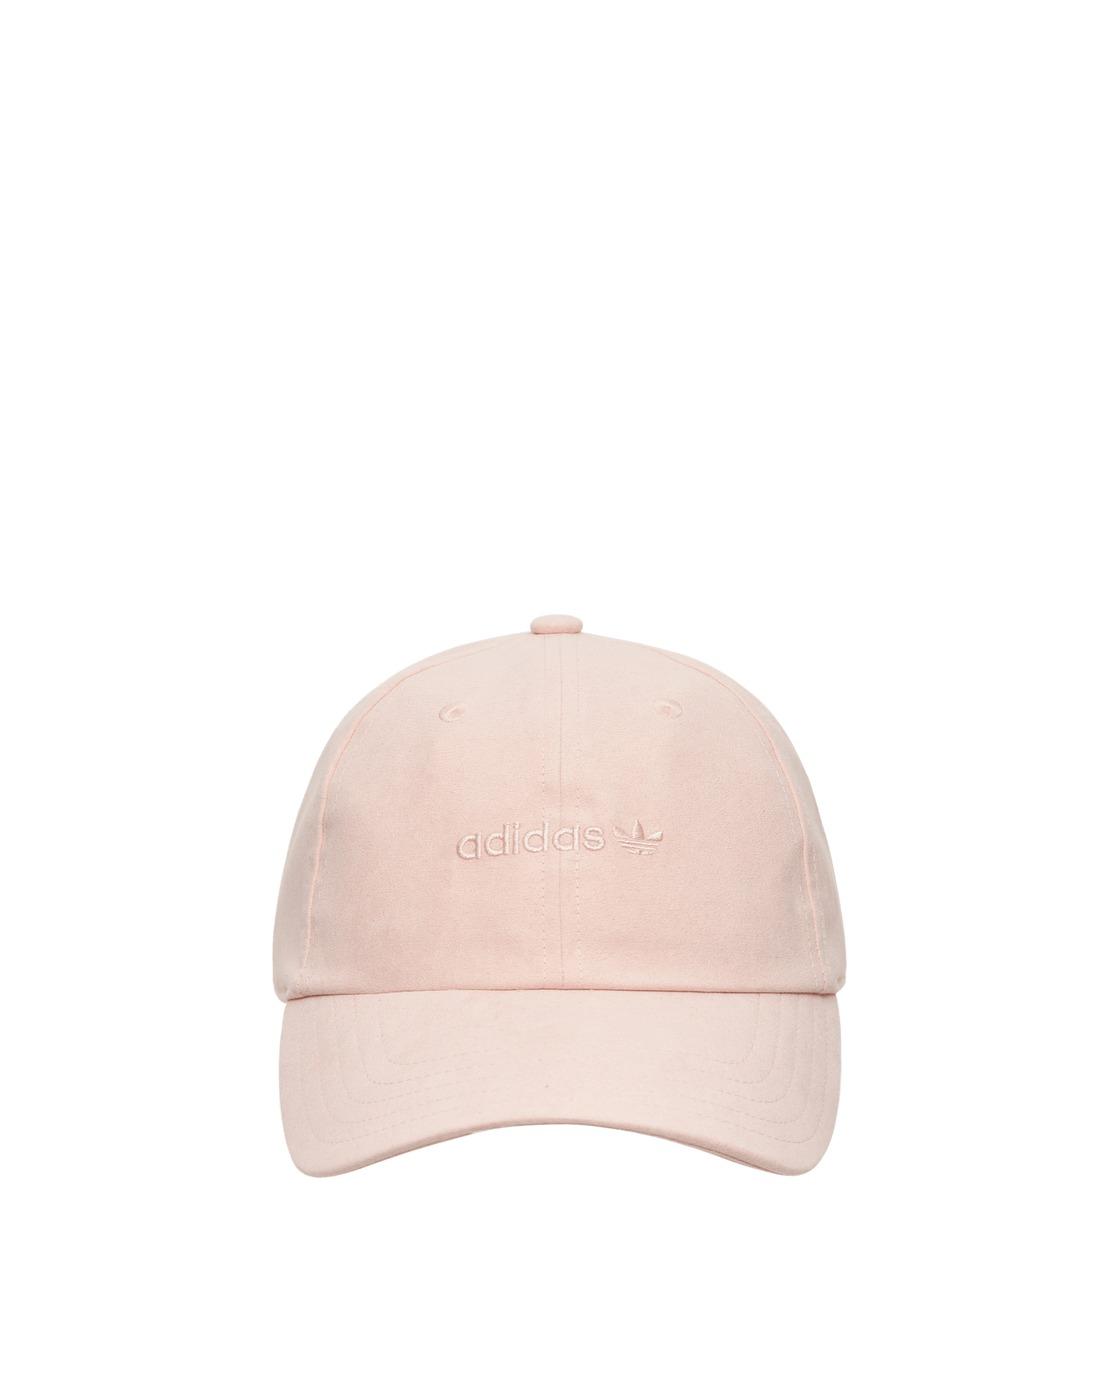 Adidas Originals Suede Bb Cap Vap Pink